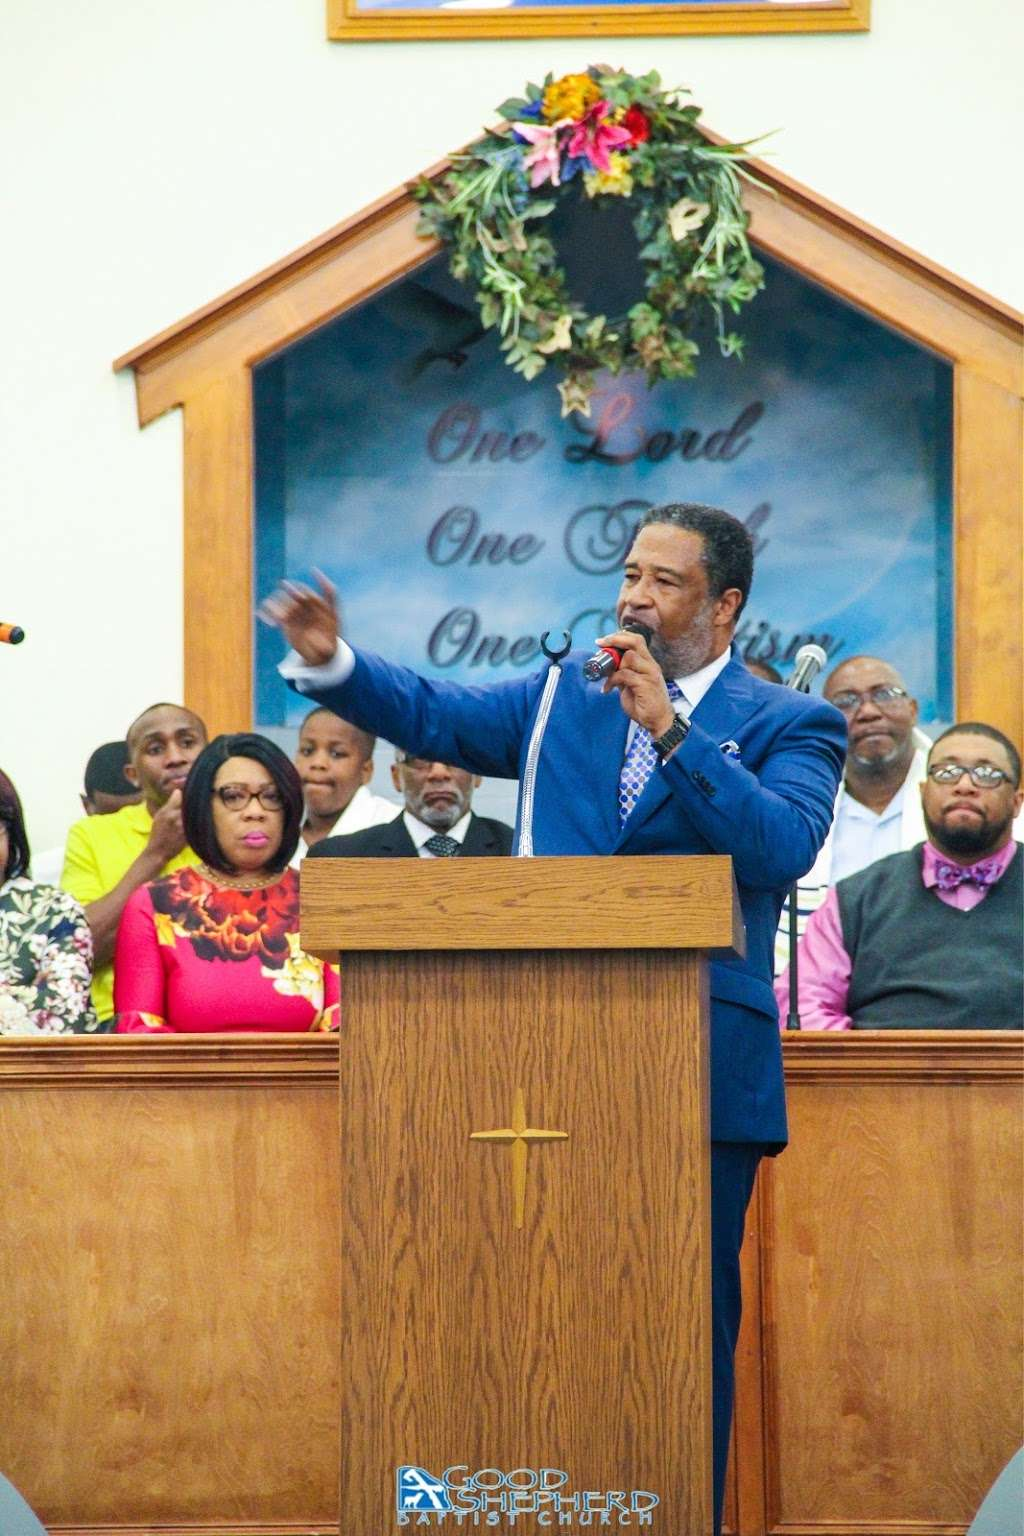 Good Shepherd Baptist Church - church  | Photo 2 of 4 | Address: 7818 Bonaire St, Houston, TX 77028, USA | Phone: (713) 672-9847